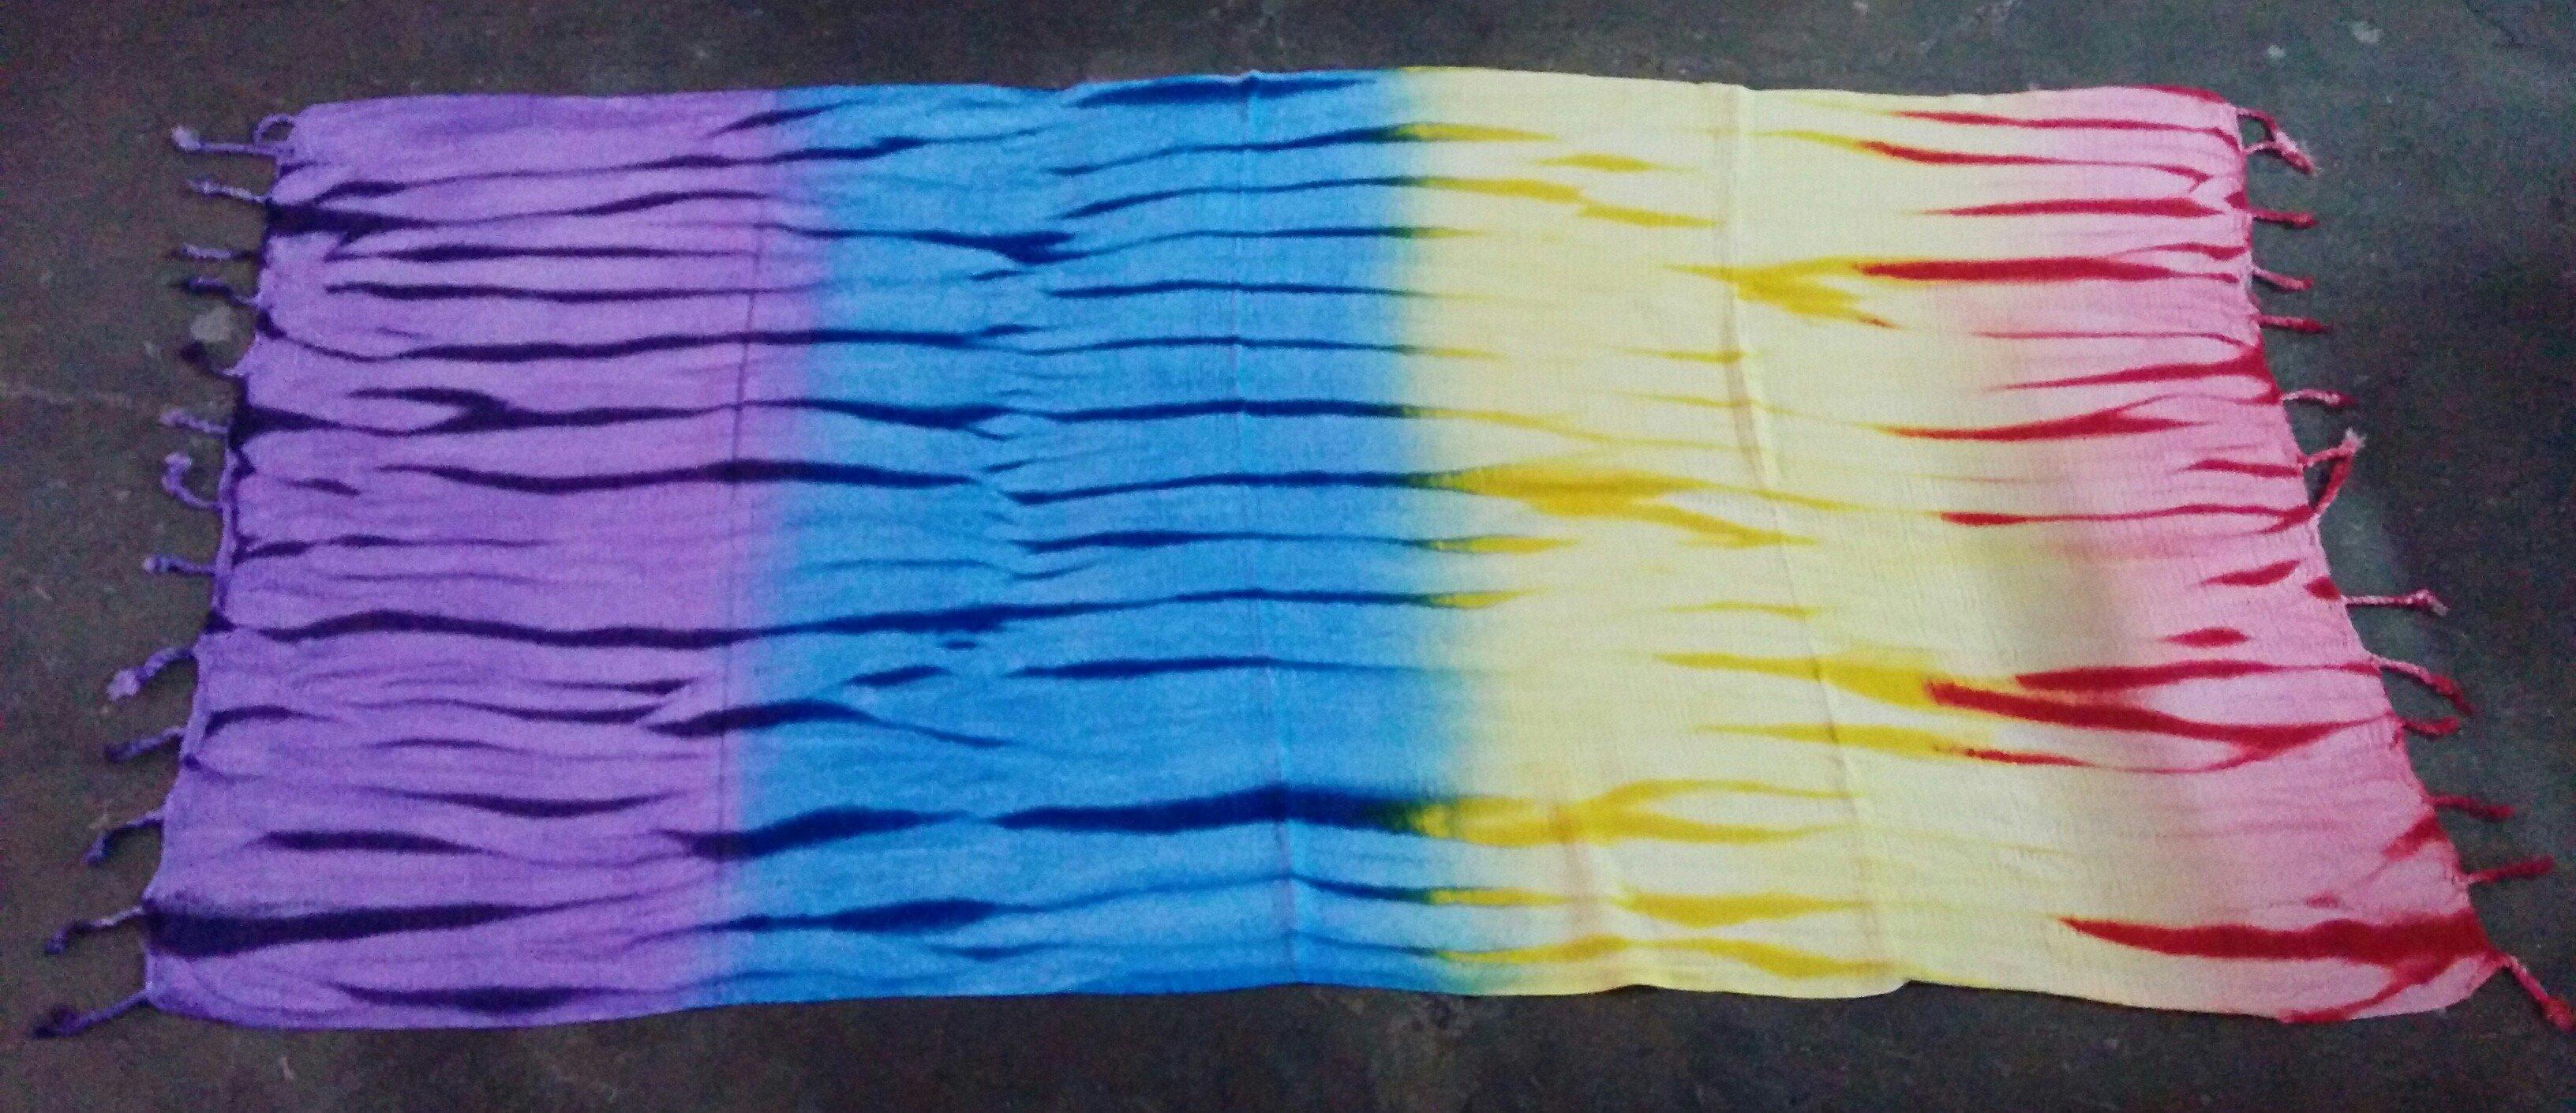 TIE Dye towel turkish